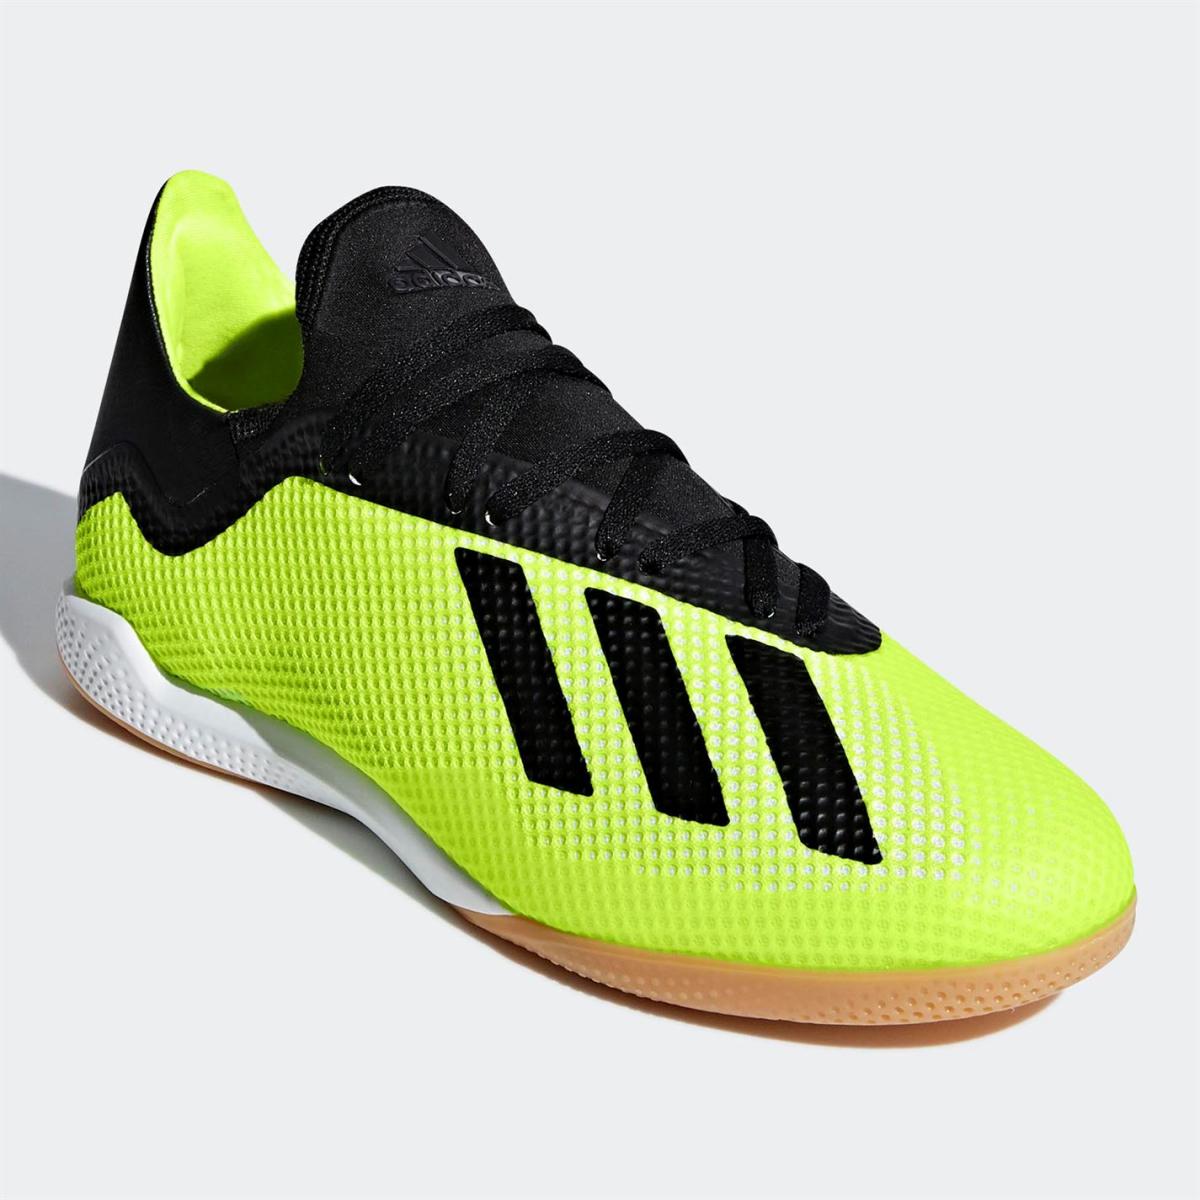 adidas X Tango 18.3 Herren Indoor Fußballschuhe SolarGelb_Blk